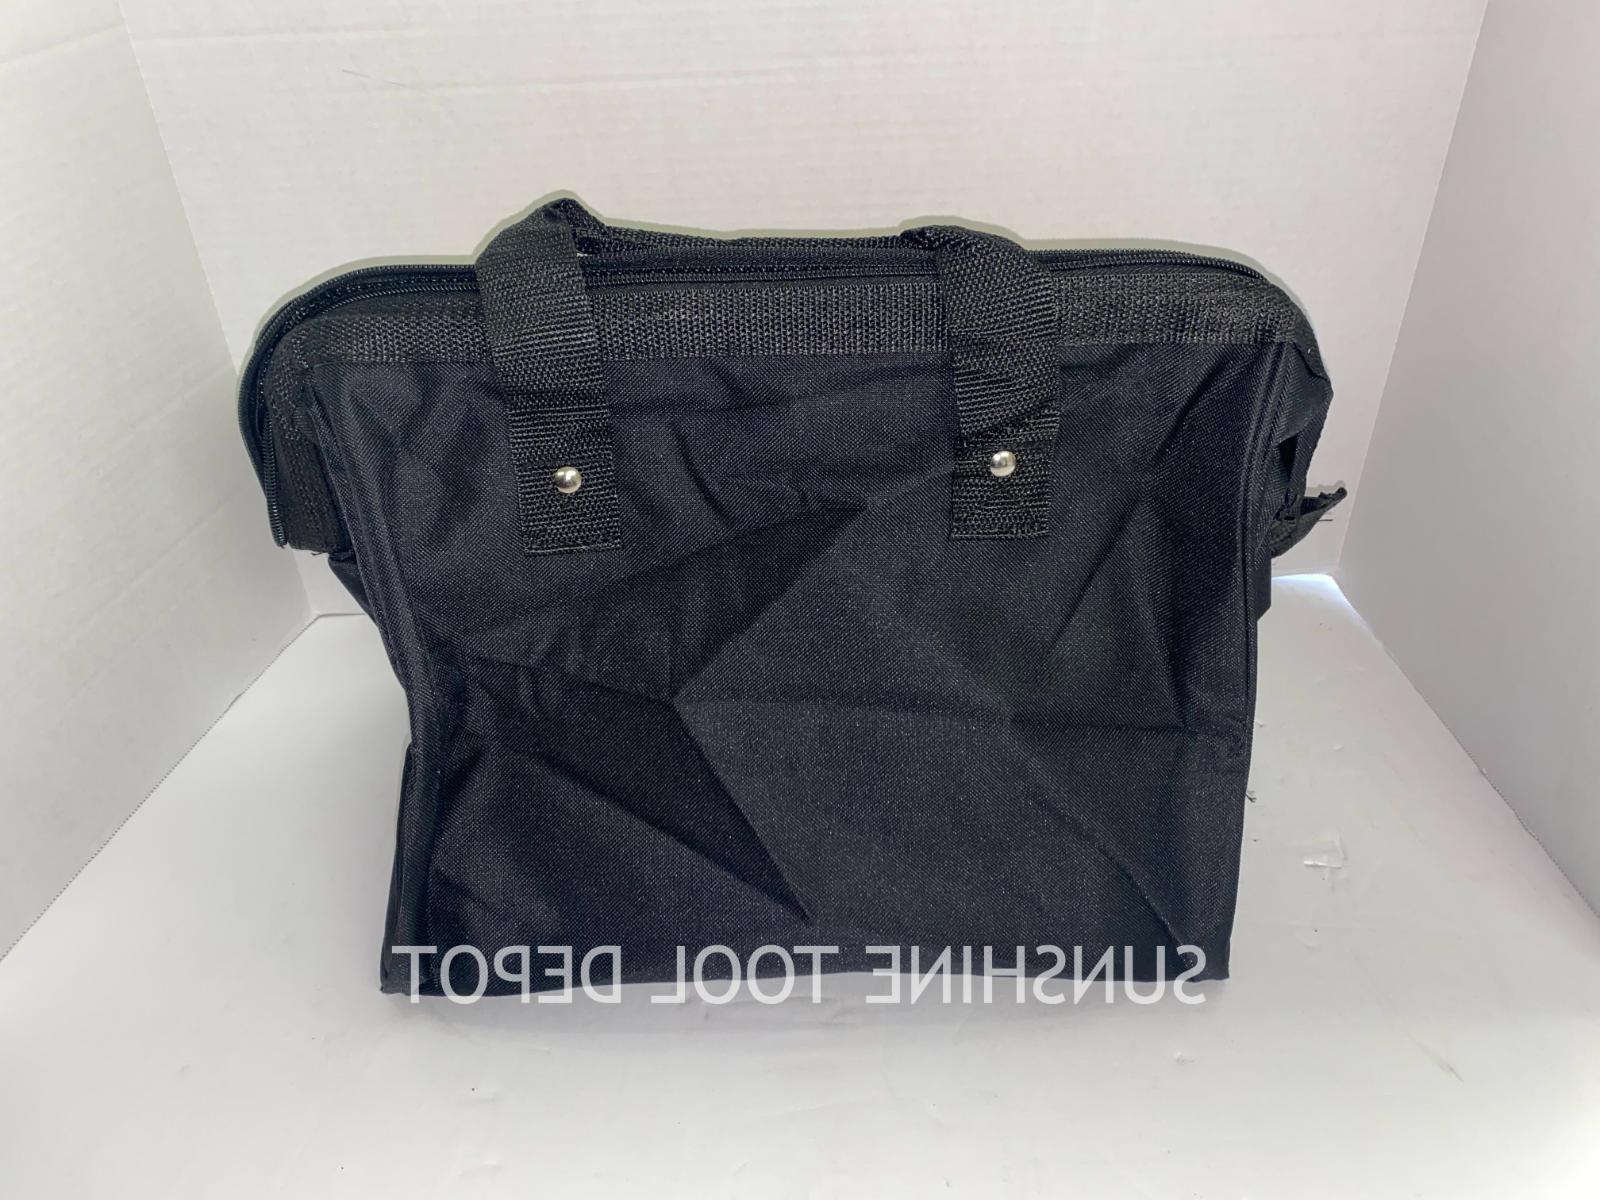 DeWalt x Tool Bag